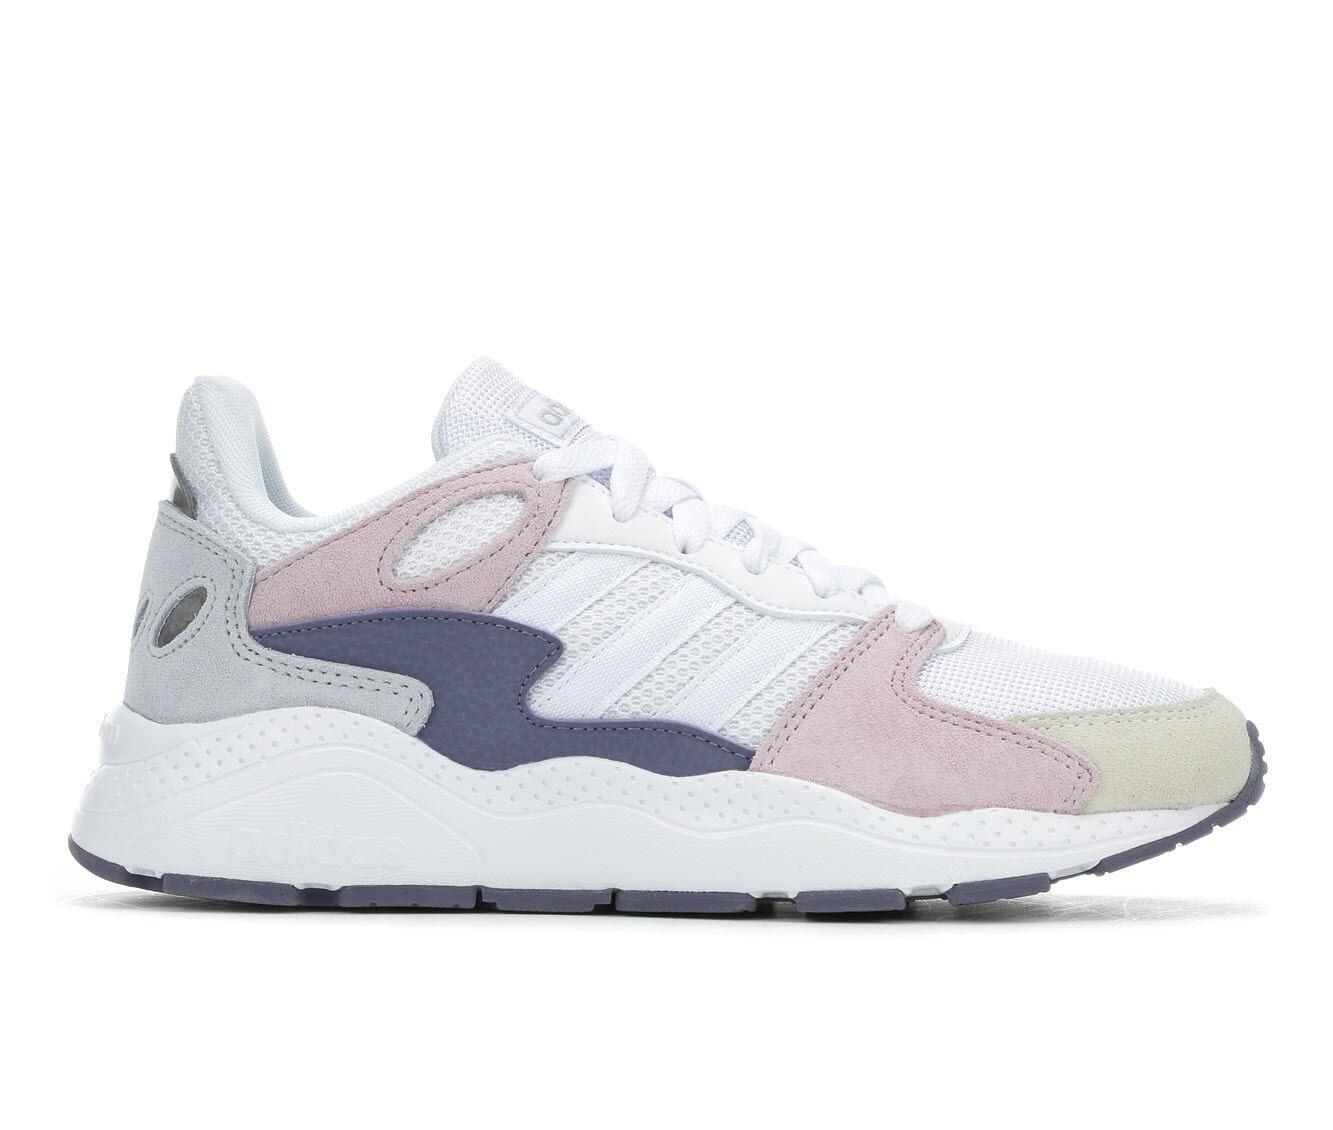 Women's Adidas Chaos Sneakers Wht/Purple/Grey